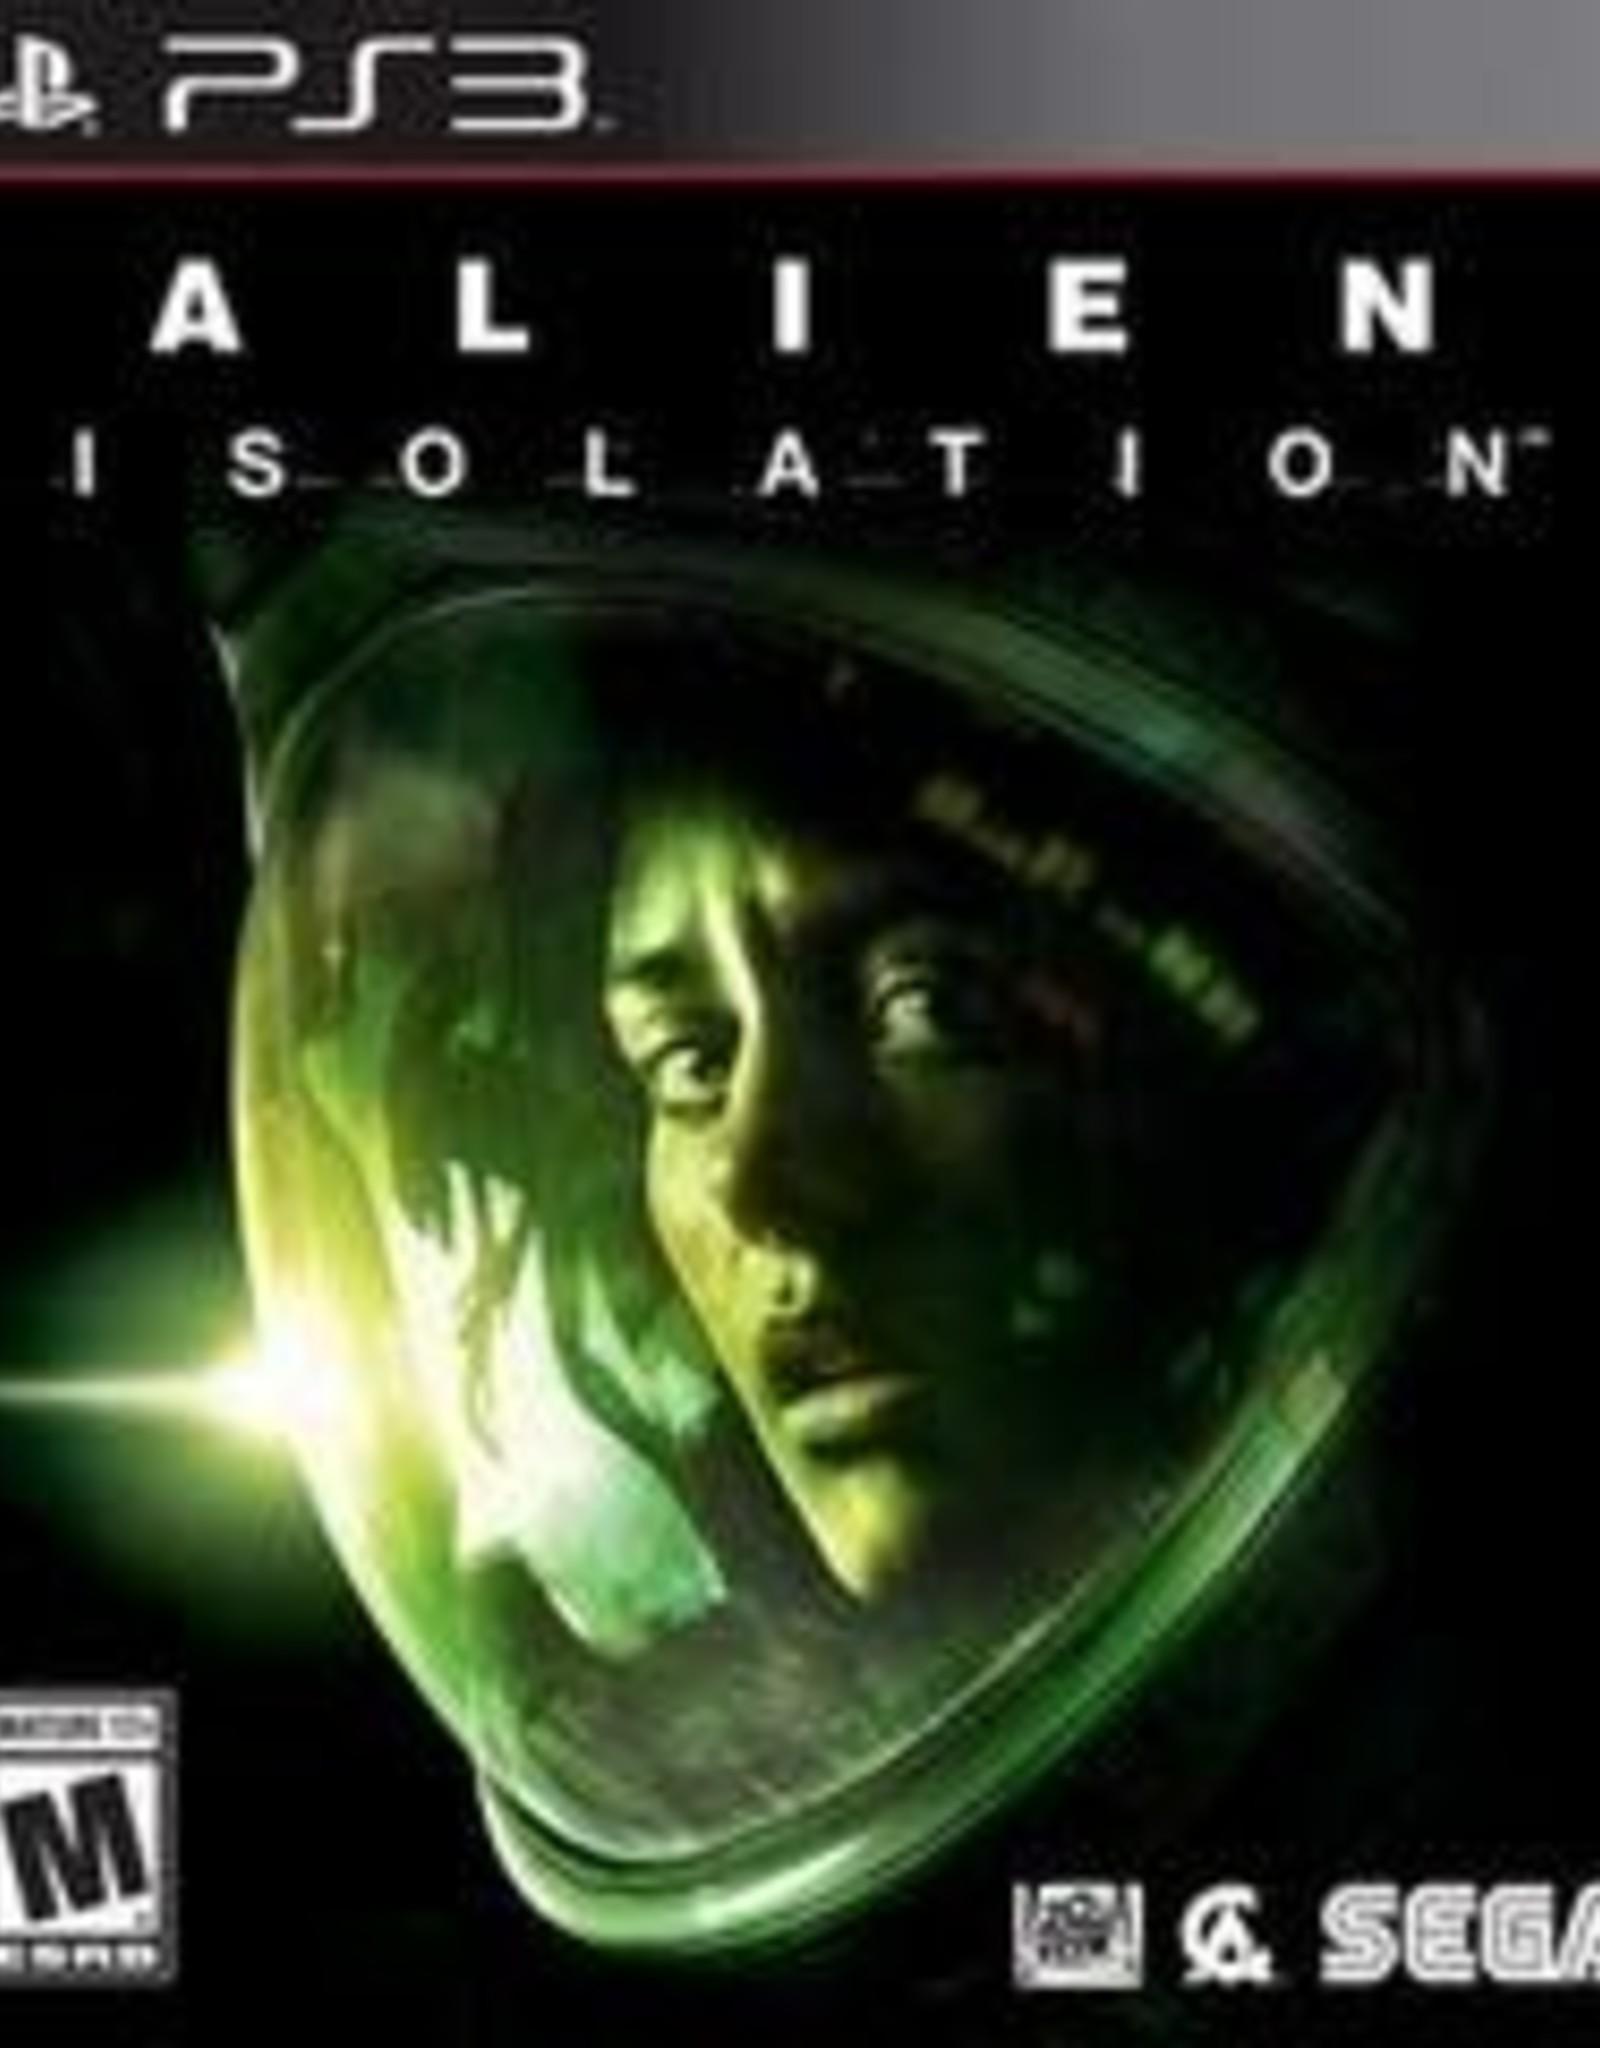 Playstation 3 Alien: Isolation